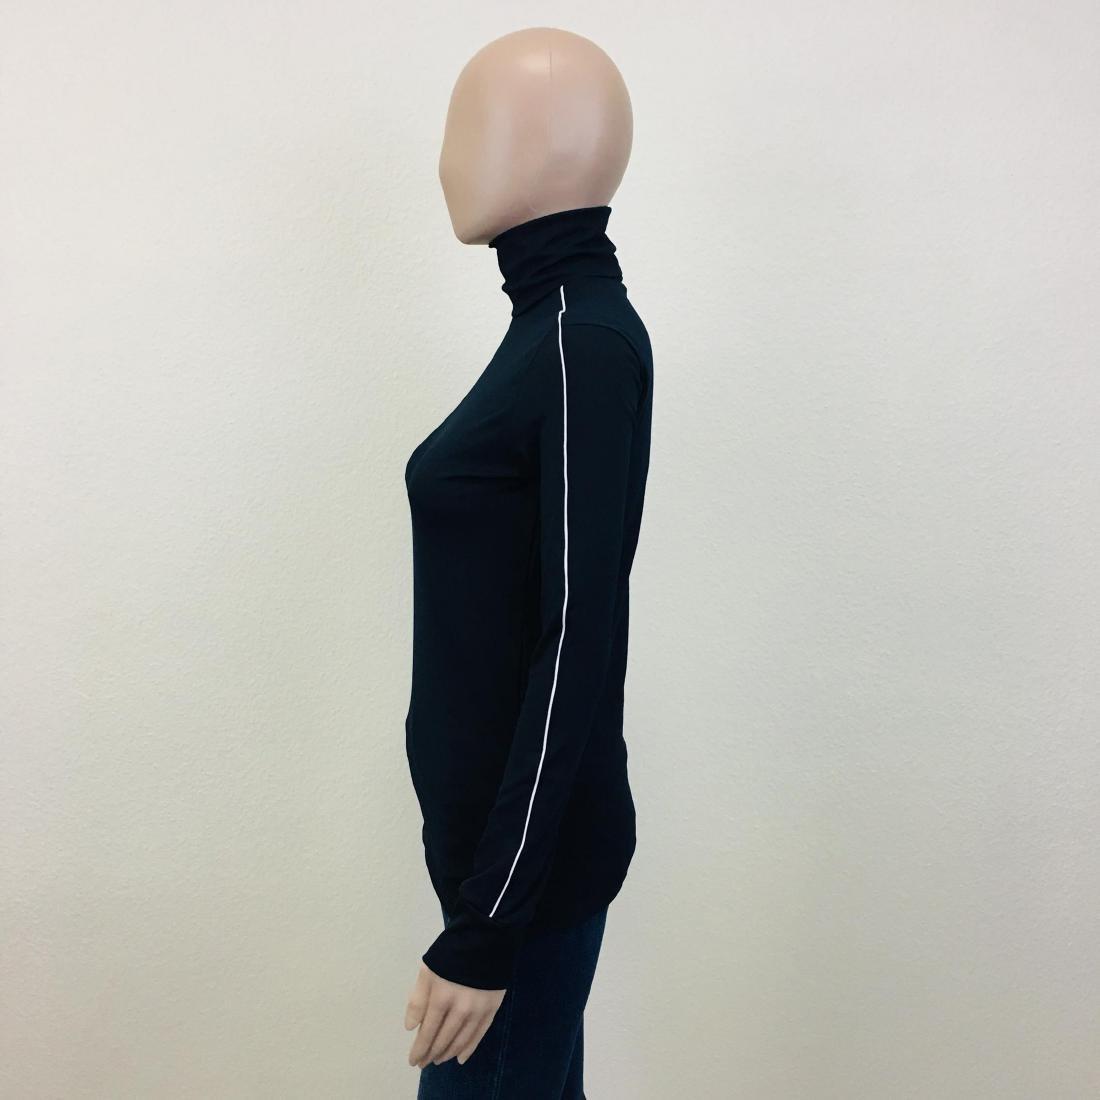 New Women's ZARA Turtleneck Sweater Size M - 6